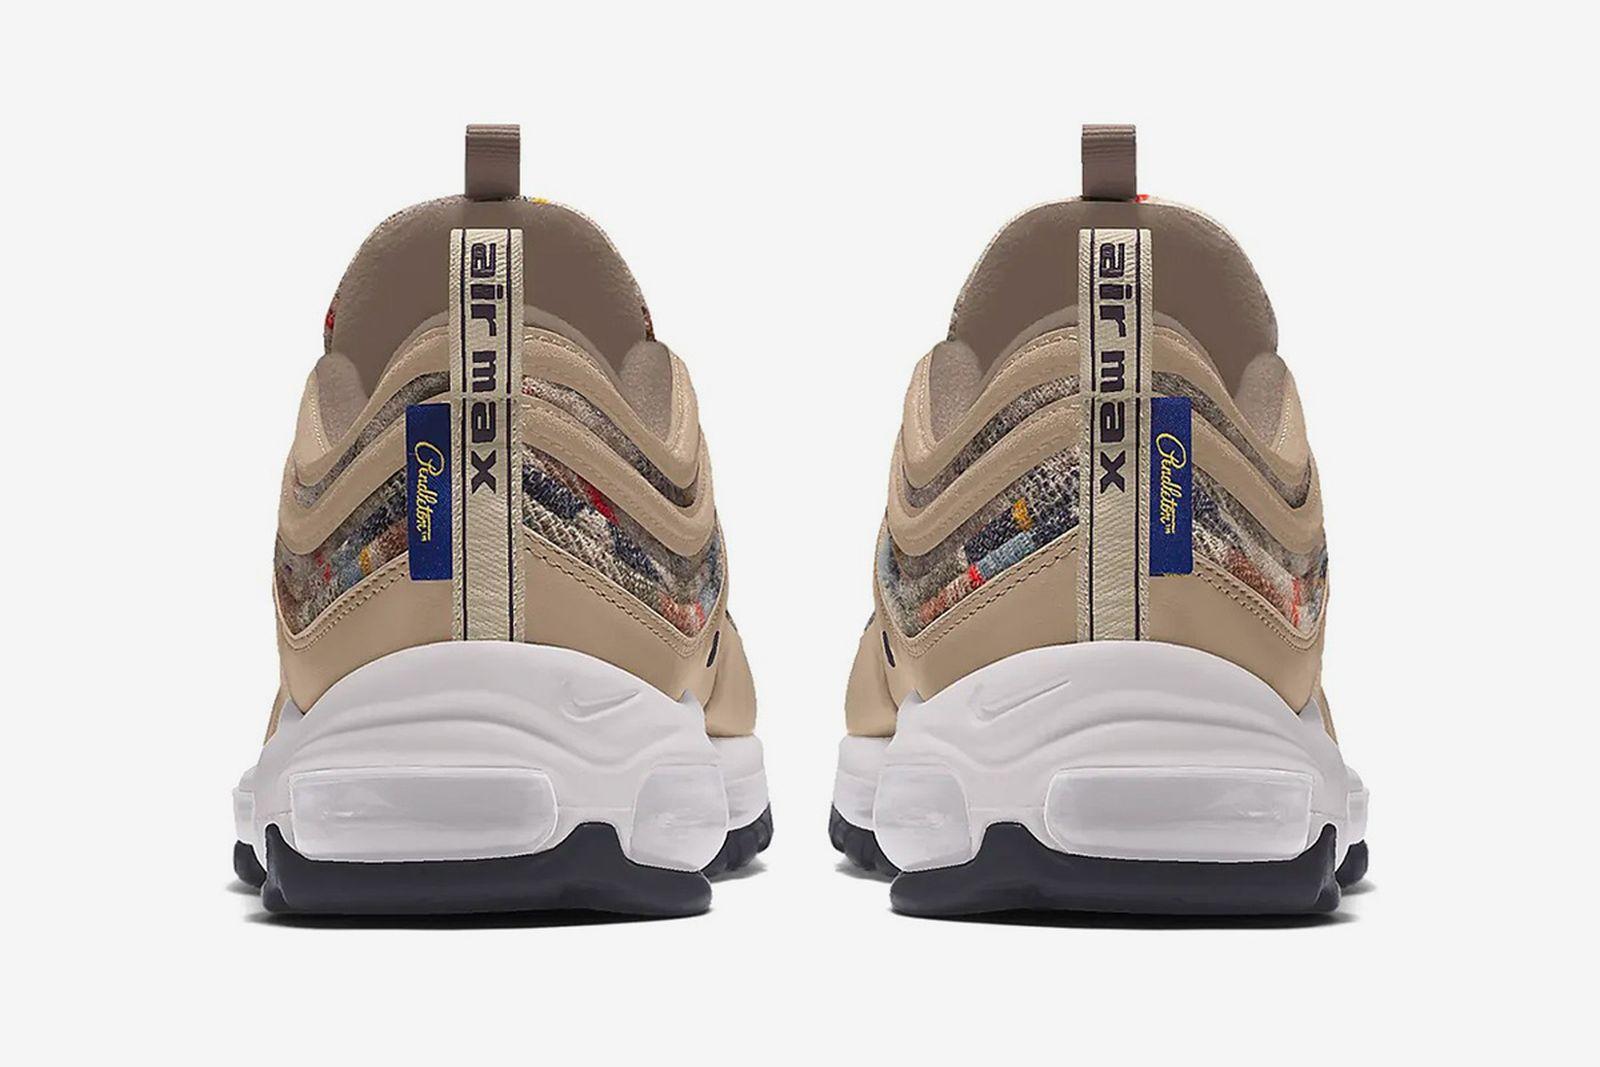 Pendleton x Nike Air Max 97